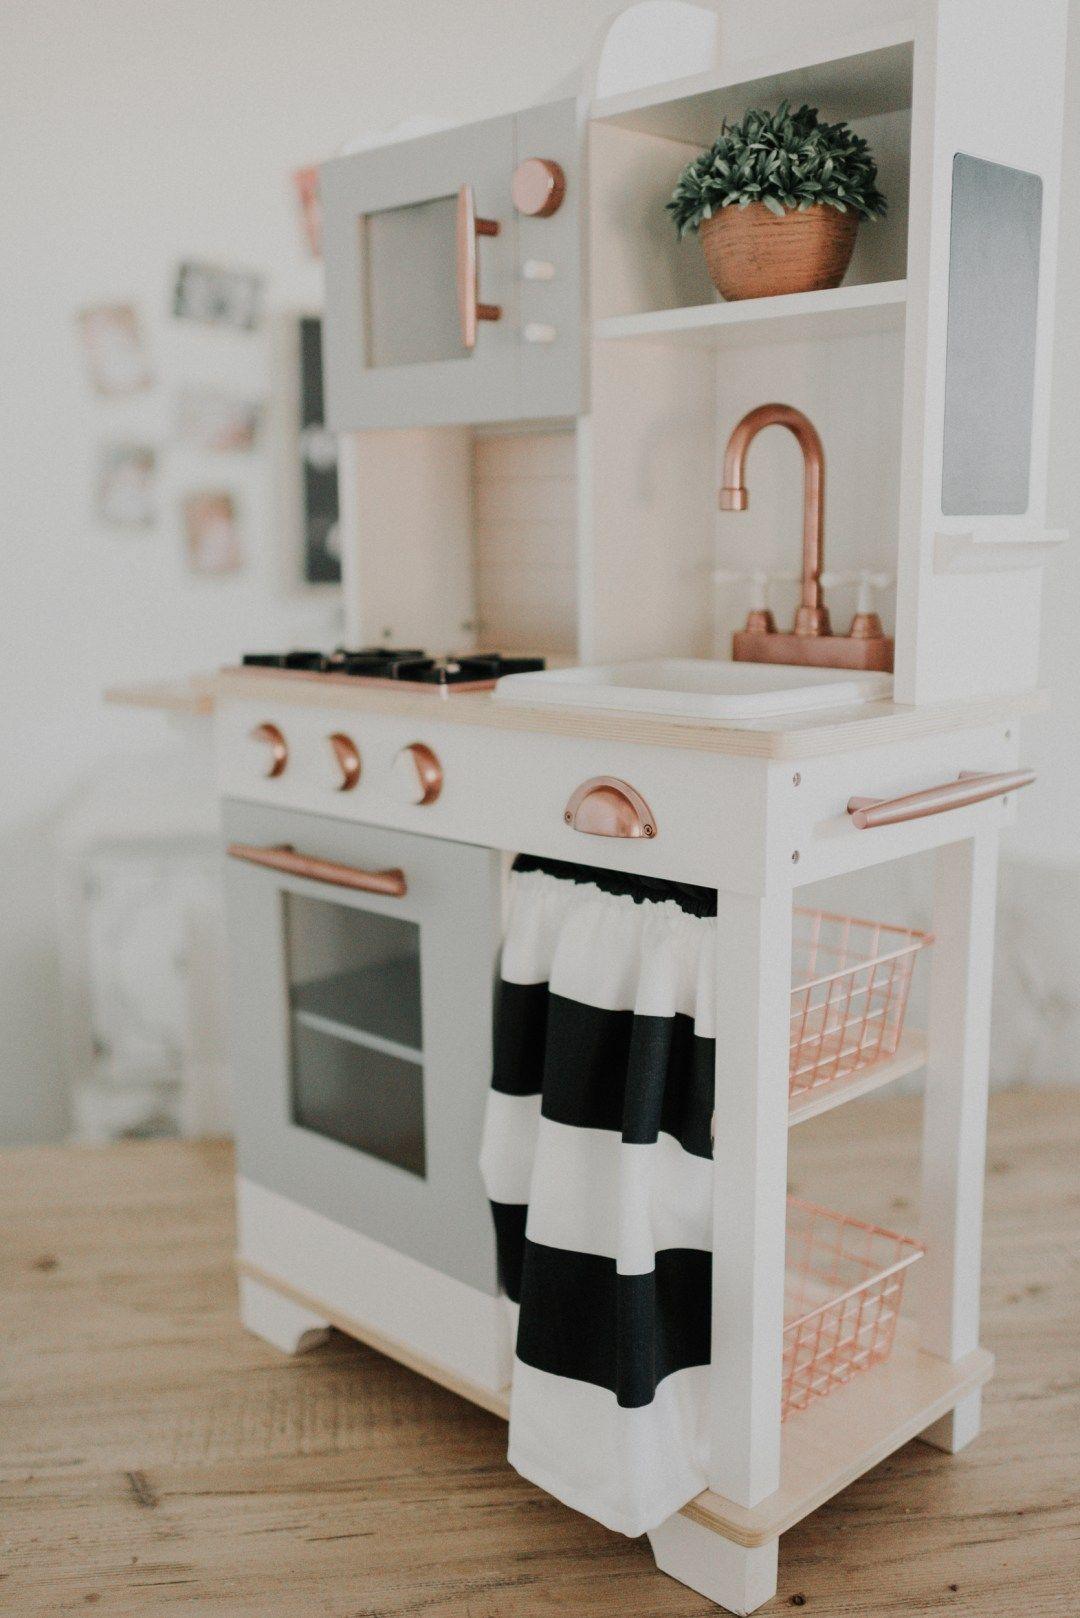 Diy farmhouse modern play kitchen do it yourself pretend kitchen